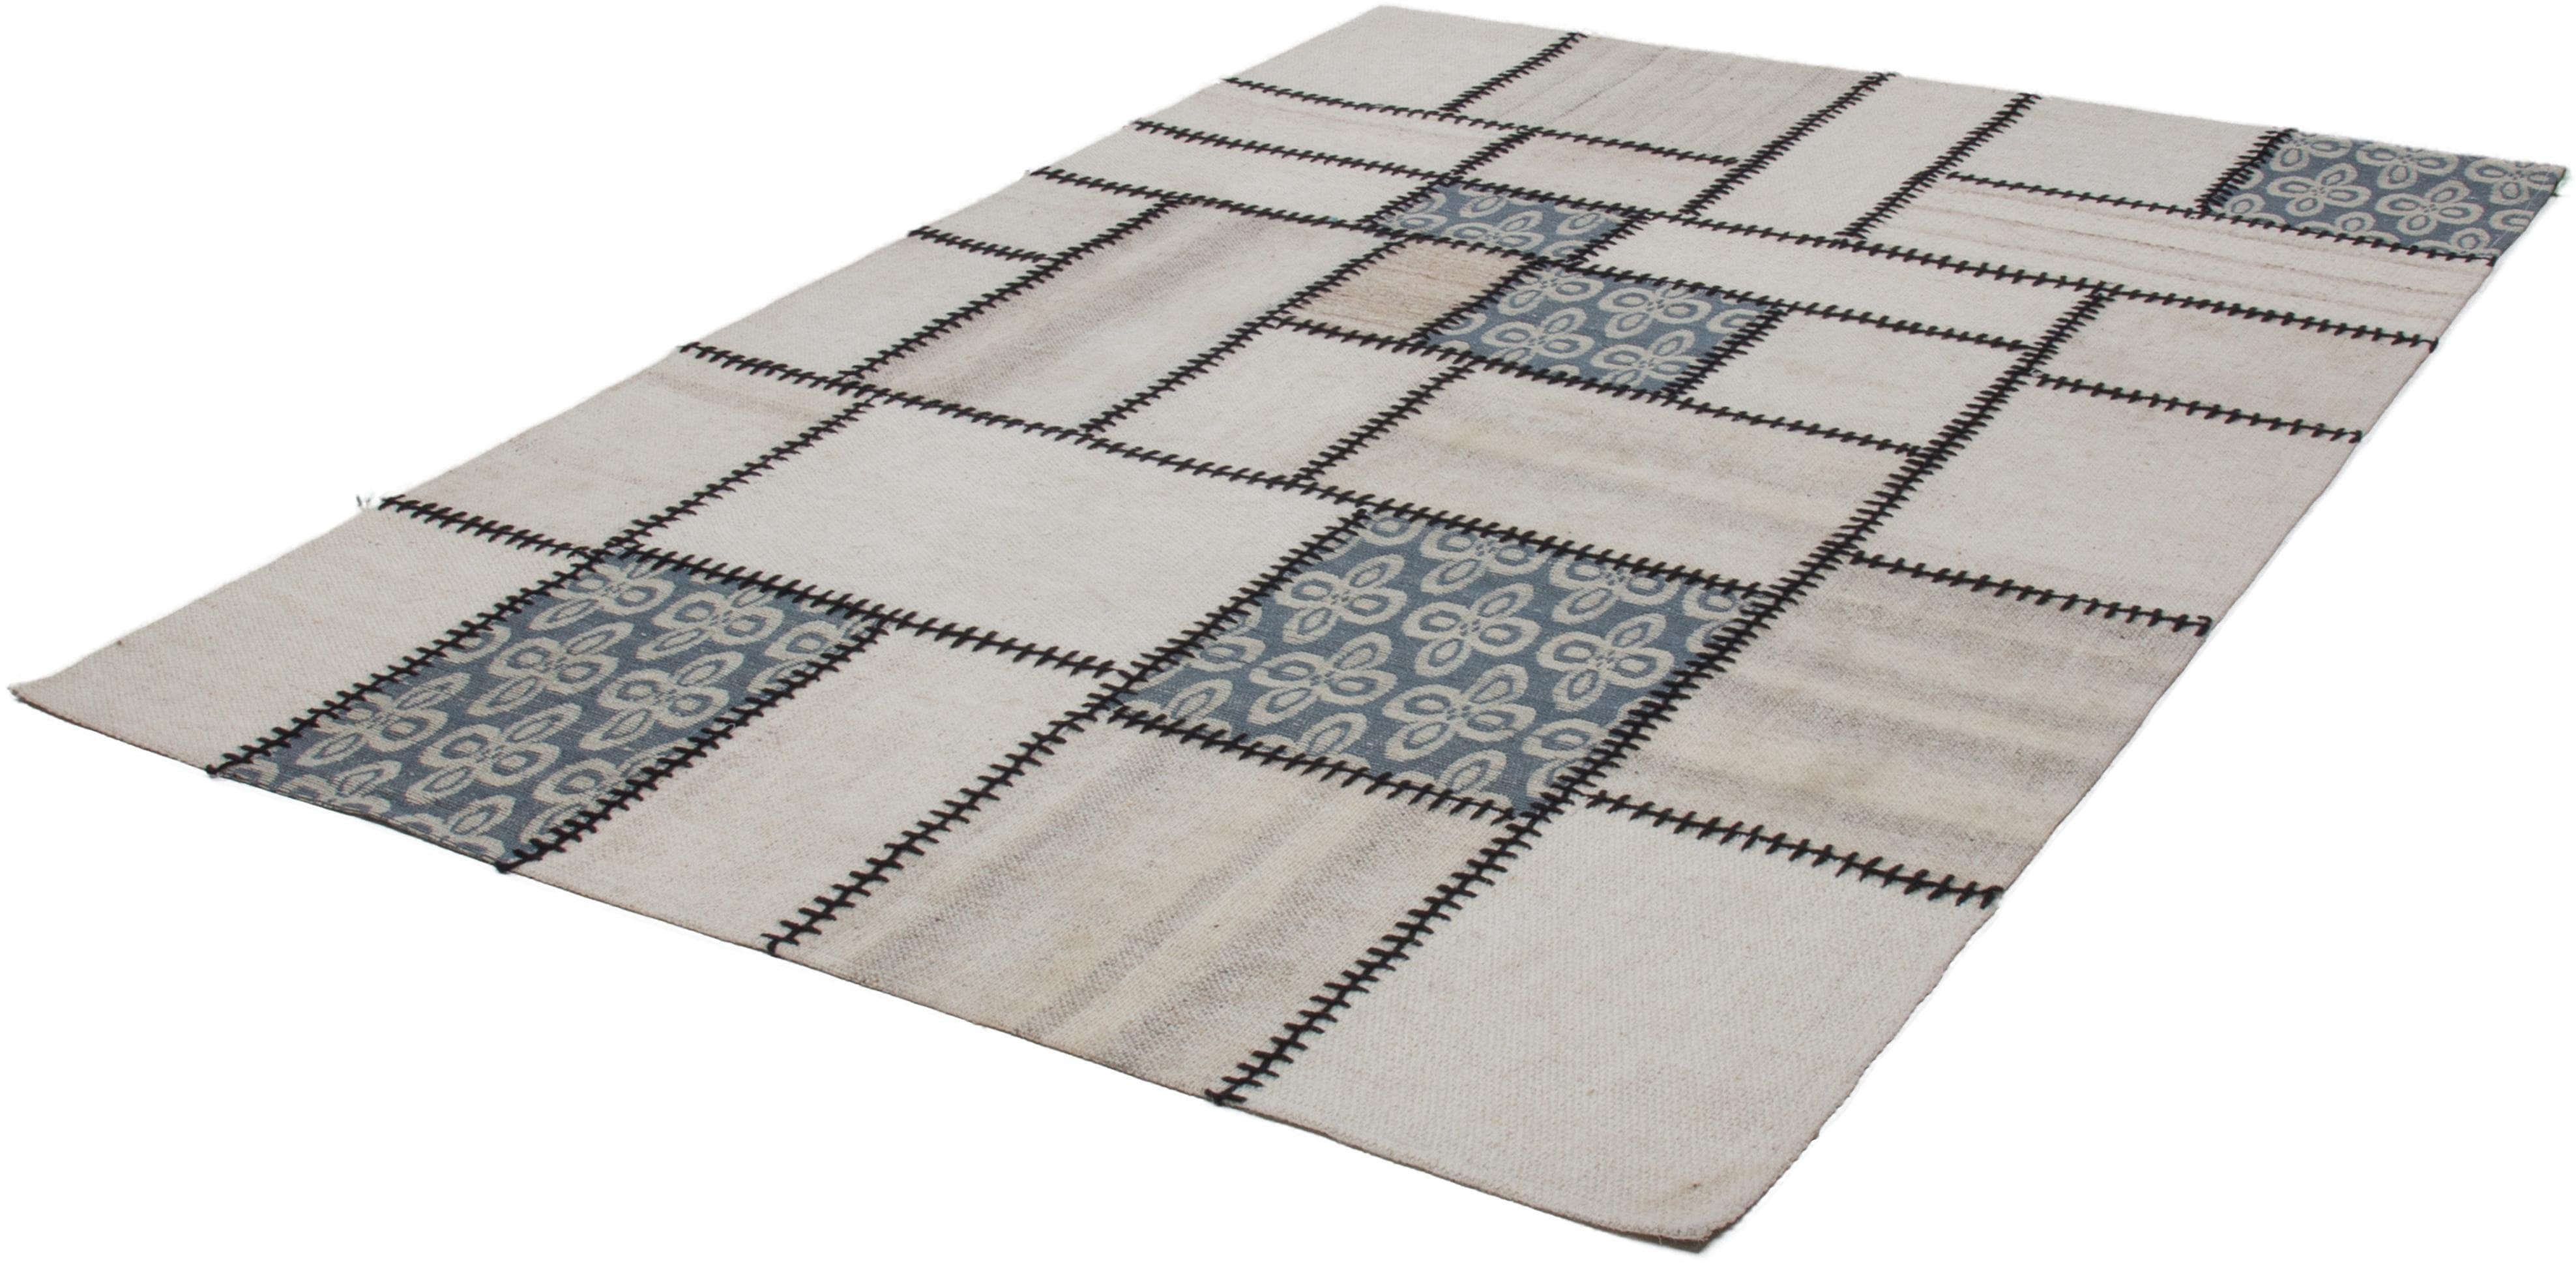 Teppich Liana 215 Kayoom rechteckig Höhe 6 mm handgewebt